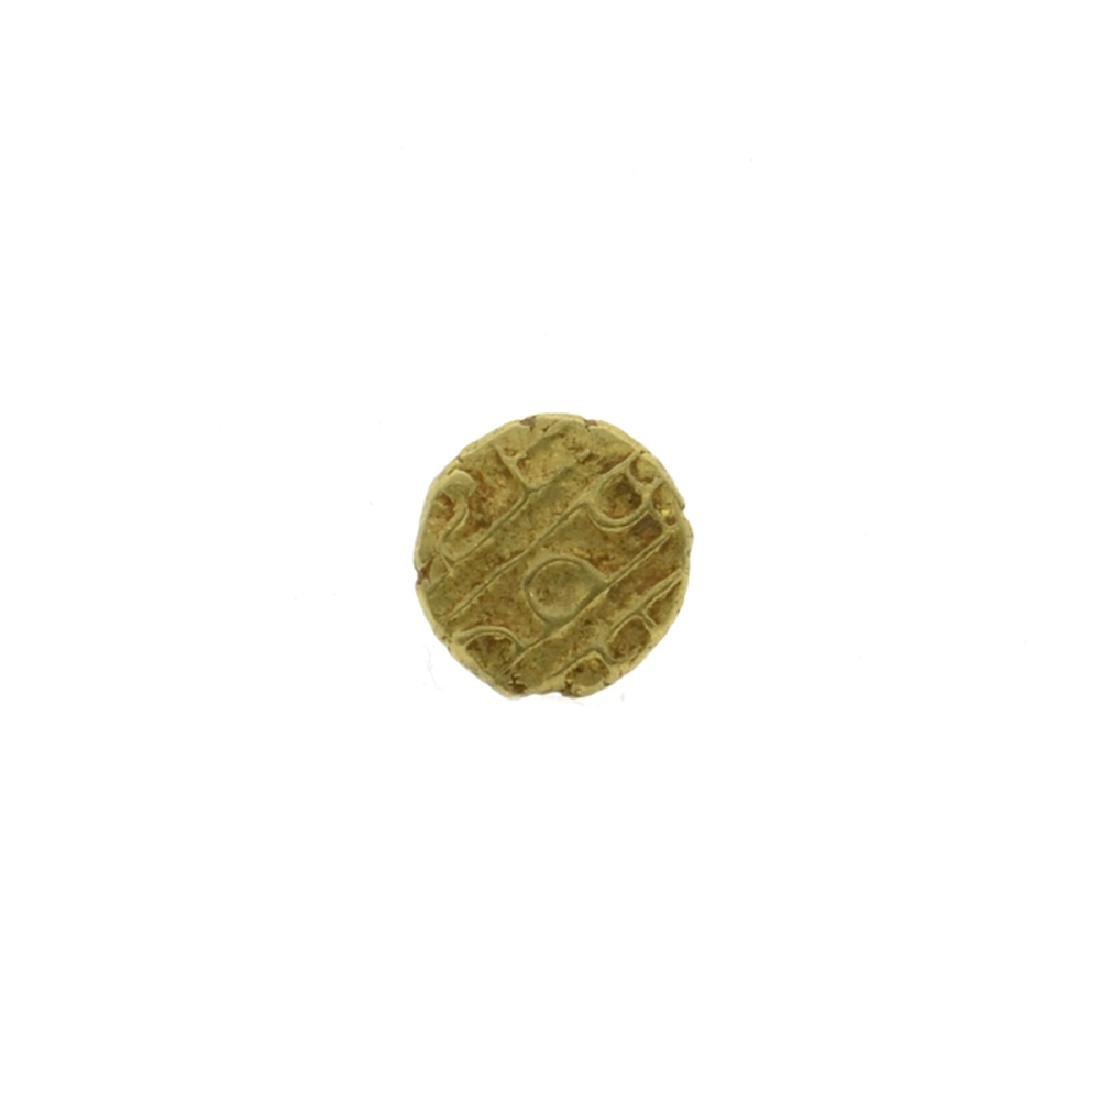 Gold Dutch India AV Fanam (1670 - 1784) Coin